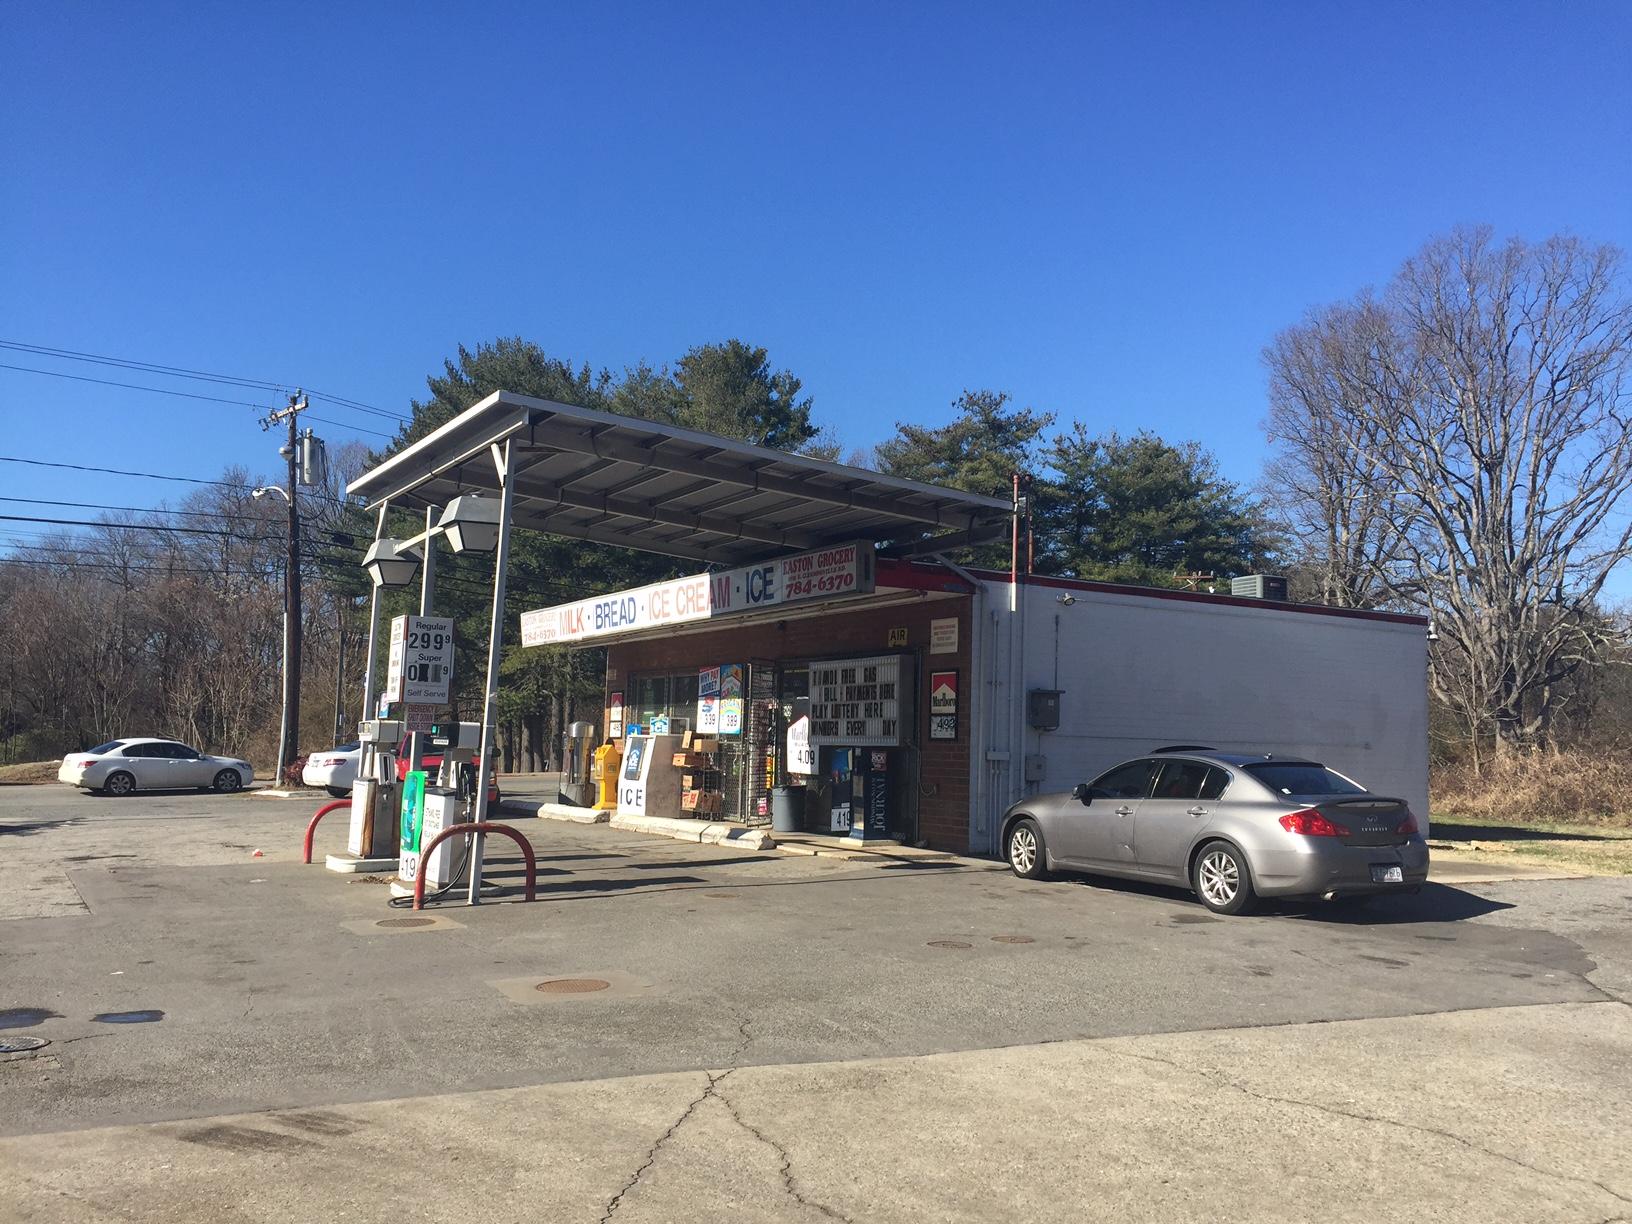 Home for sale: Convenience Store & Land for Development, Winston-Salem, NC